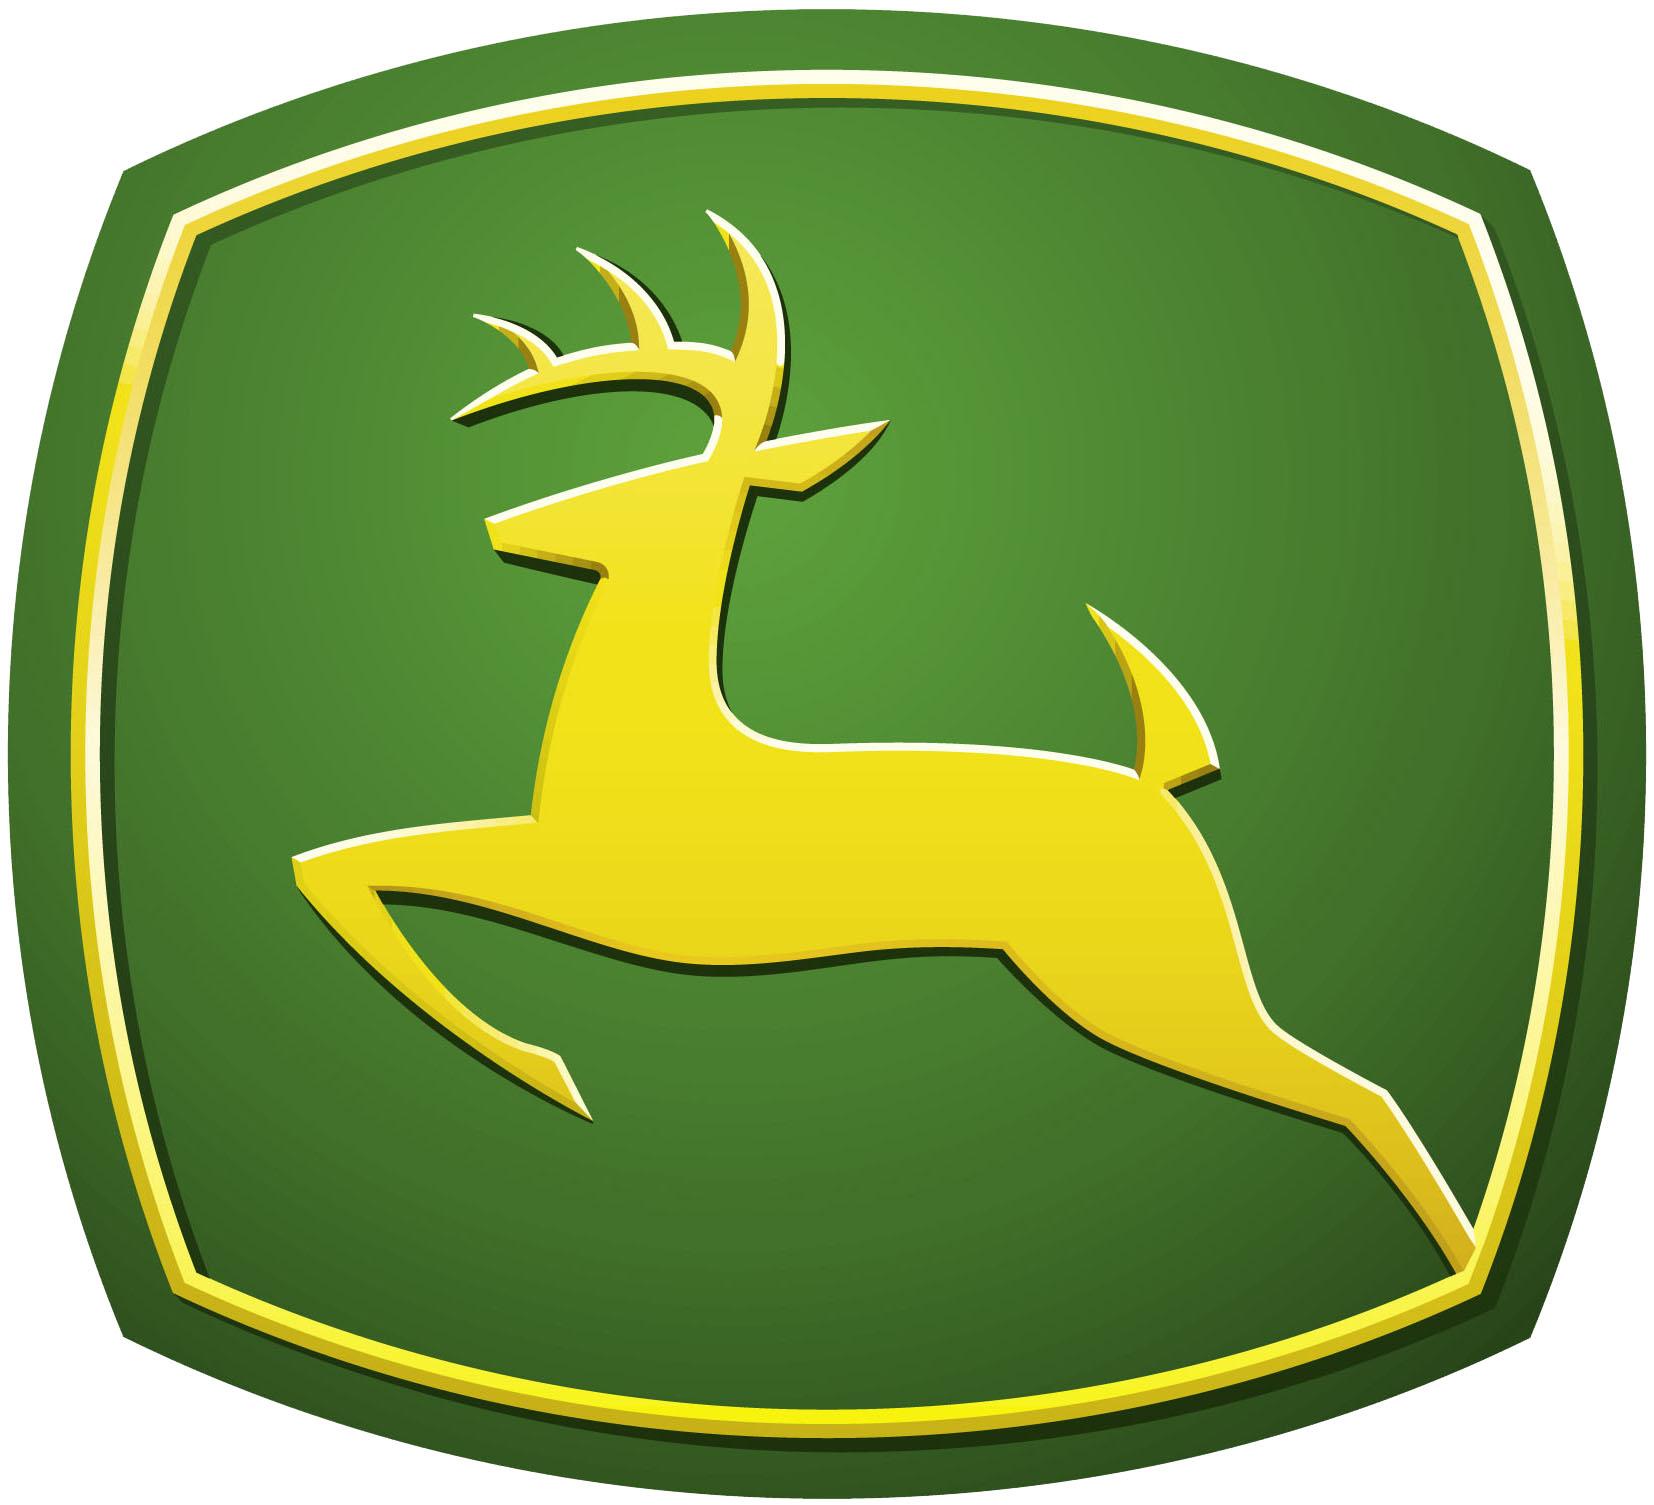 john deere combine clipart at getdrawings com free for personal rh getdrawings com john deere mower clip art john deere clip art black and white